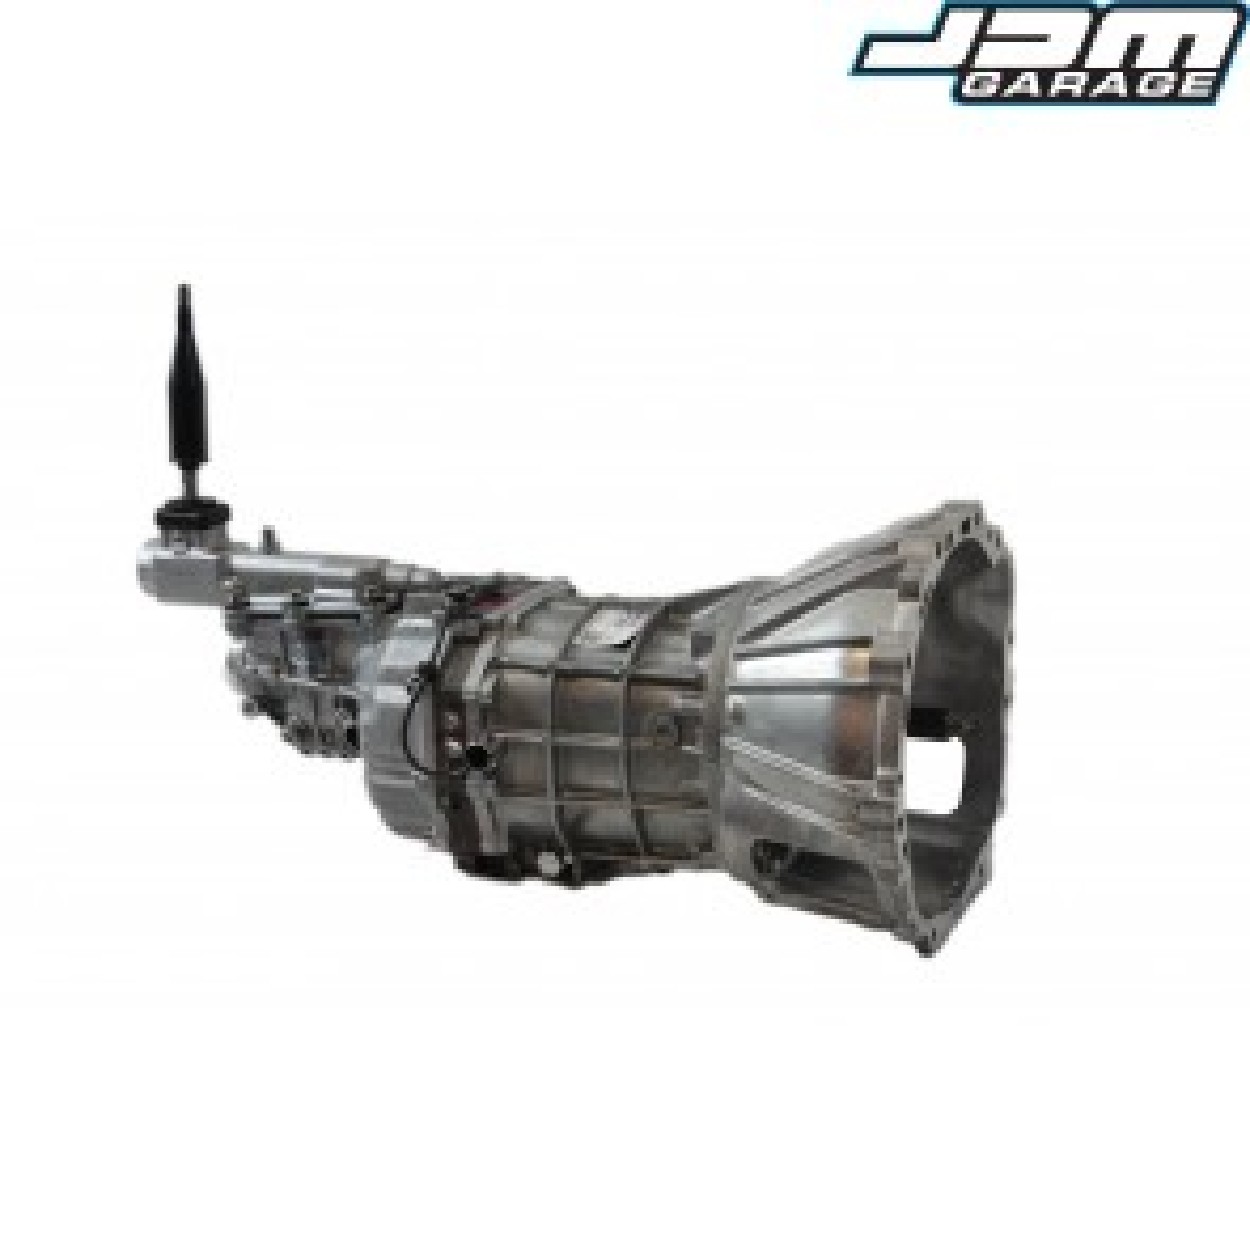 Genuine Toyota R154 5 Speed Gearbox for Chaser Cresta Mark II JZX100 JZX110 Verossa VR25 Soarer JZZ30 33030-2A630